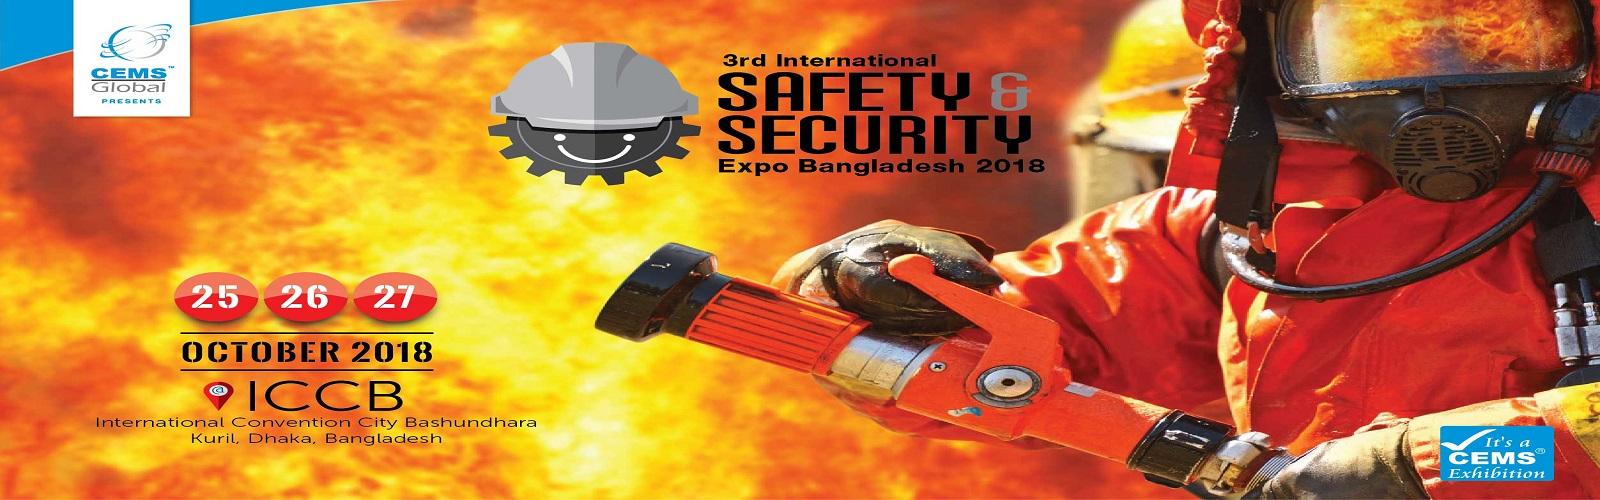 3rd International Safety & Security Expo Bangladesh 2018